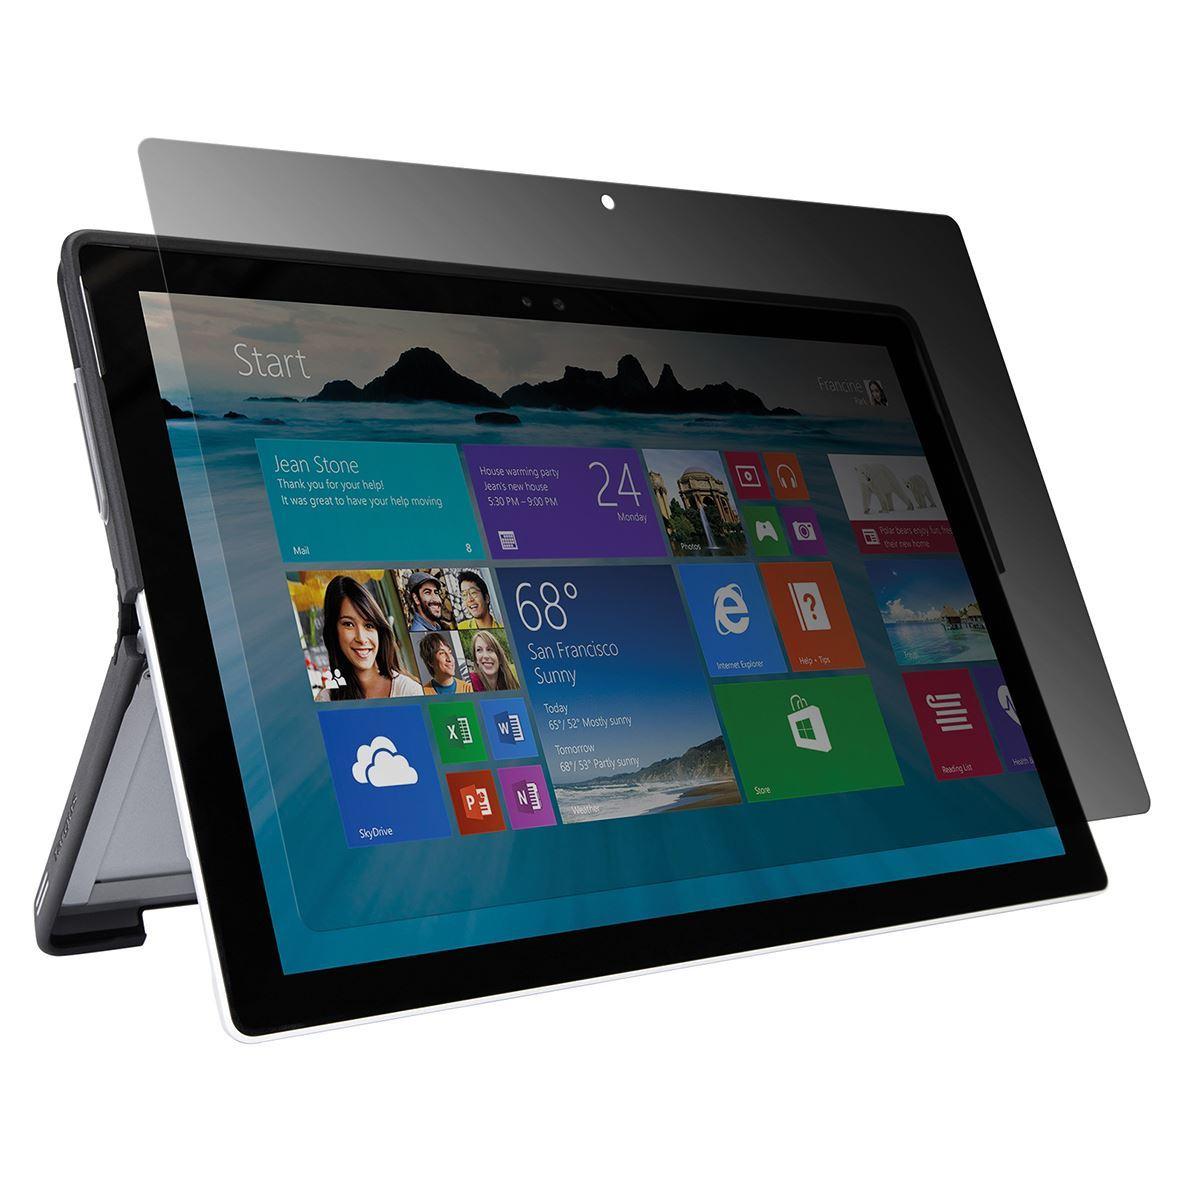 Targus AST025EUZ tablet screen protector Clear screen protector Microsoft 1 pc(s)